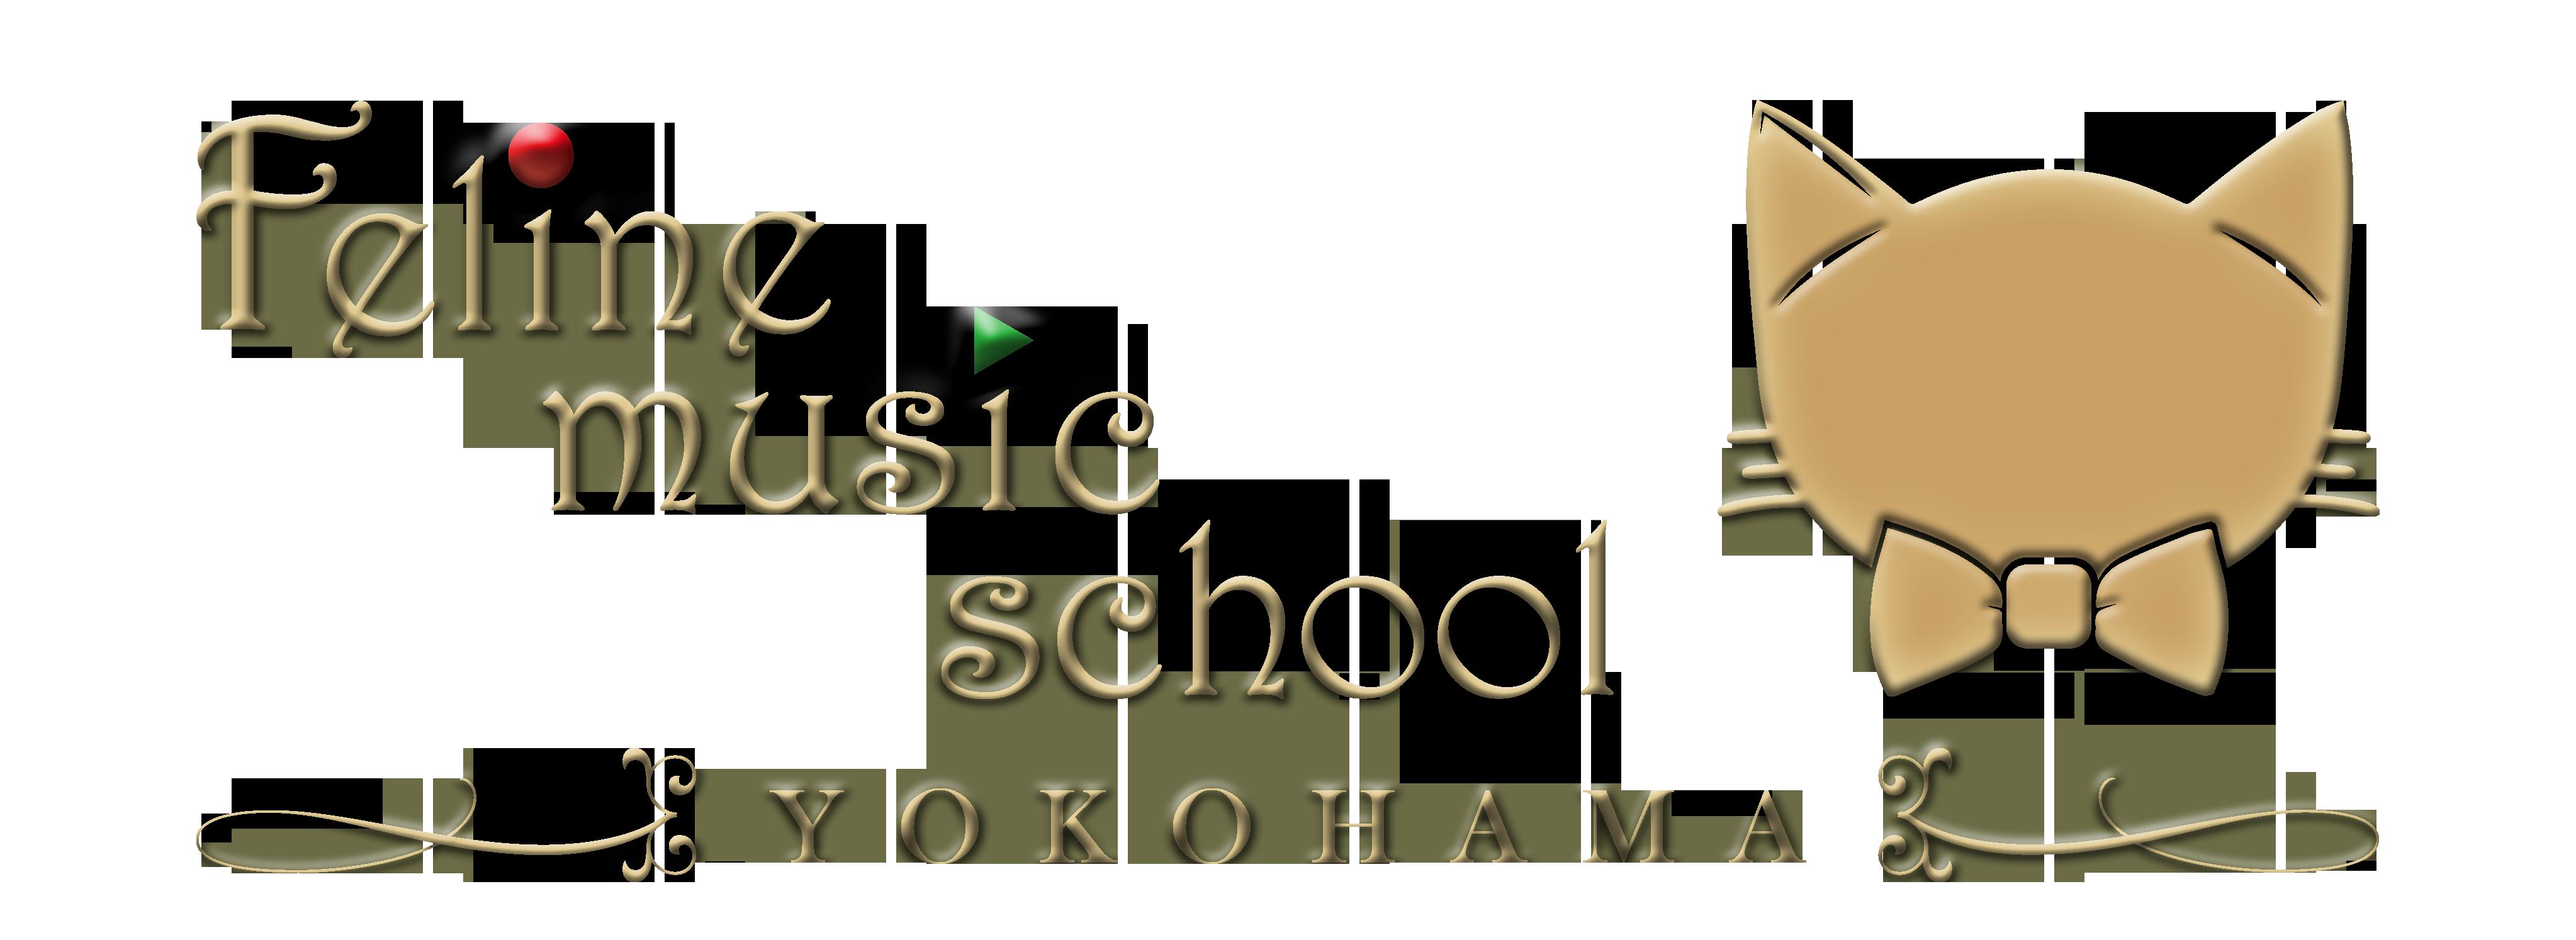 Feline music school | フェリーヌミュージックスクール横浜